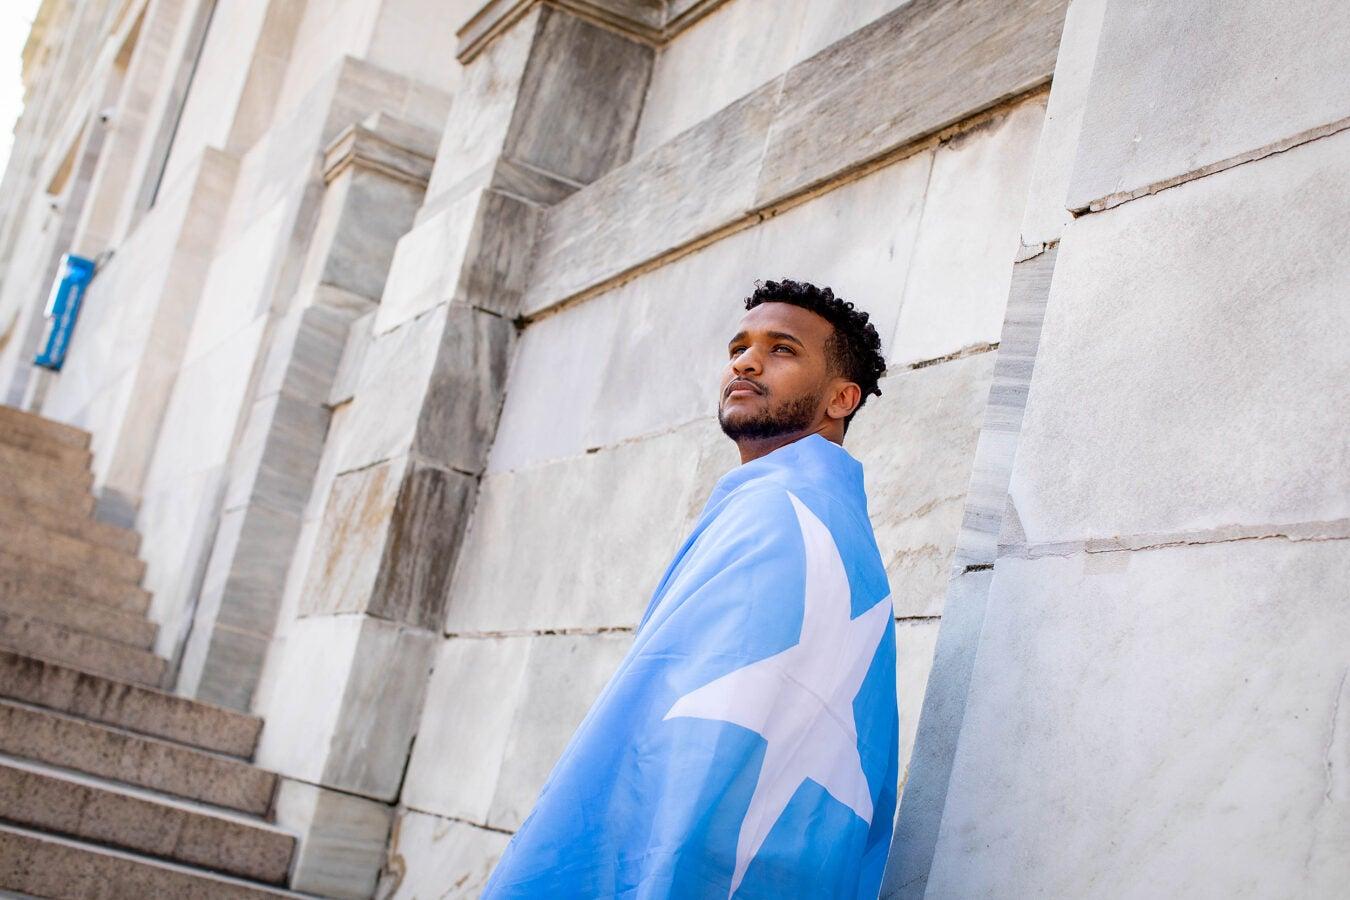 Ahmed Ahmed